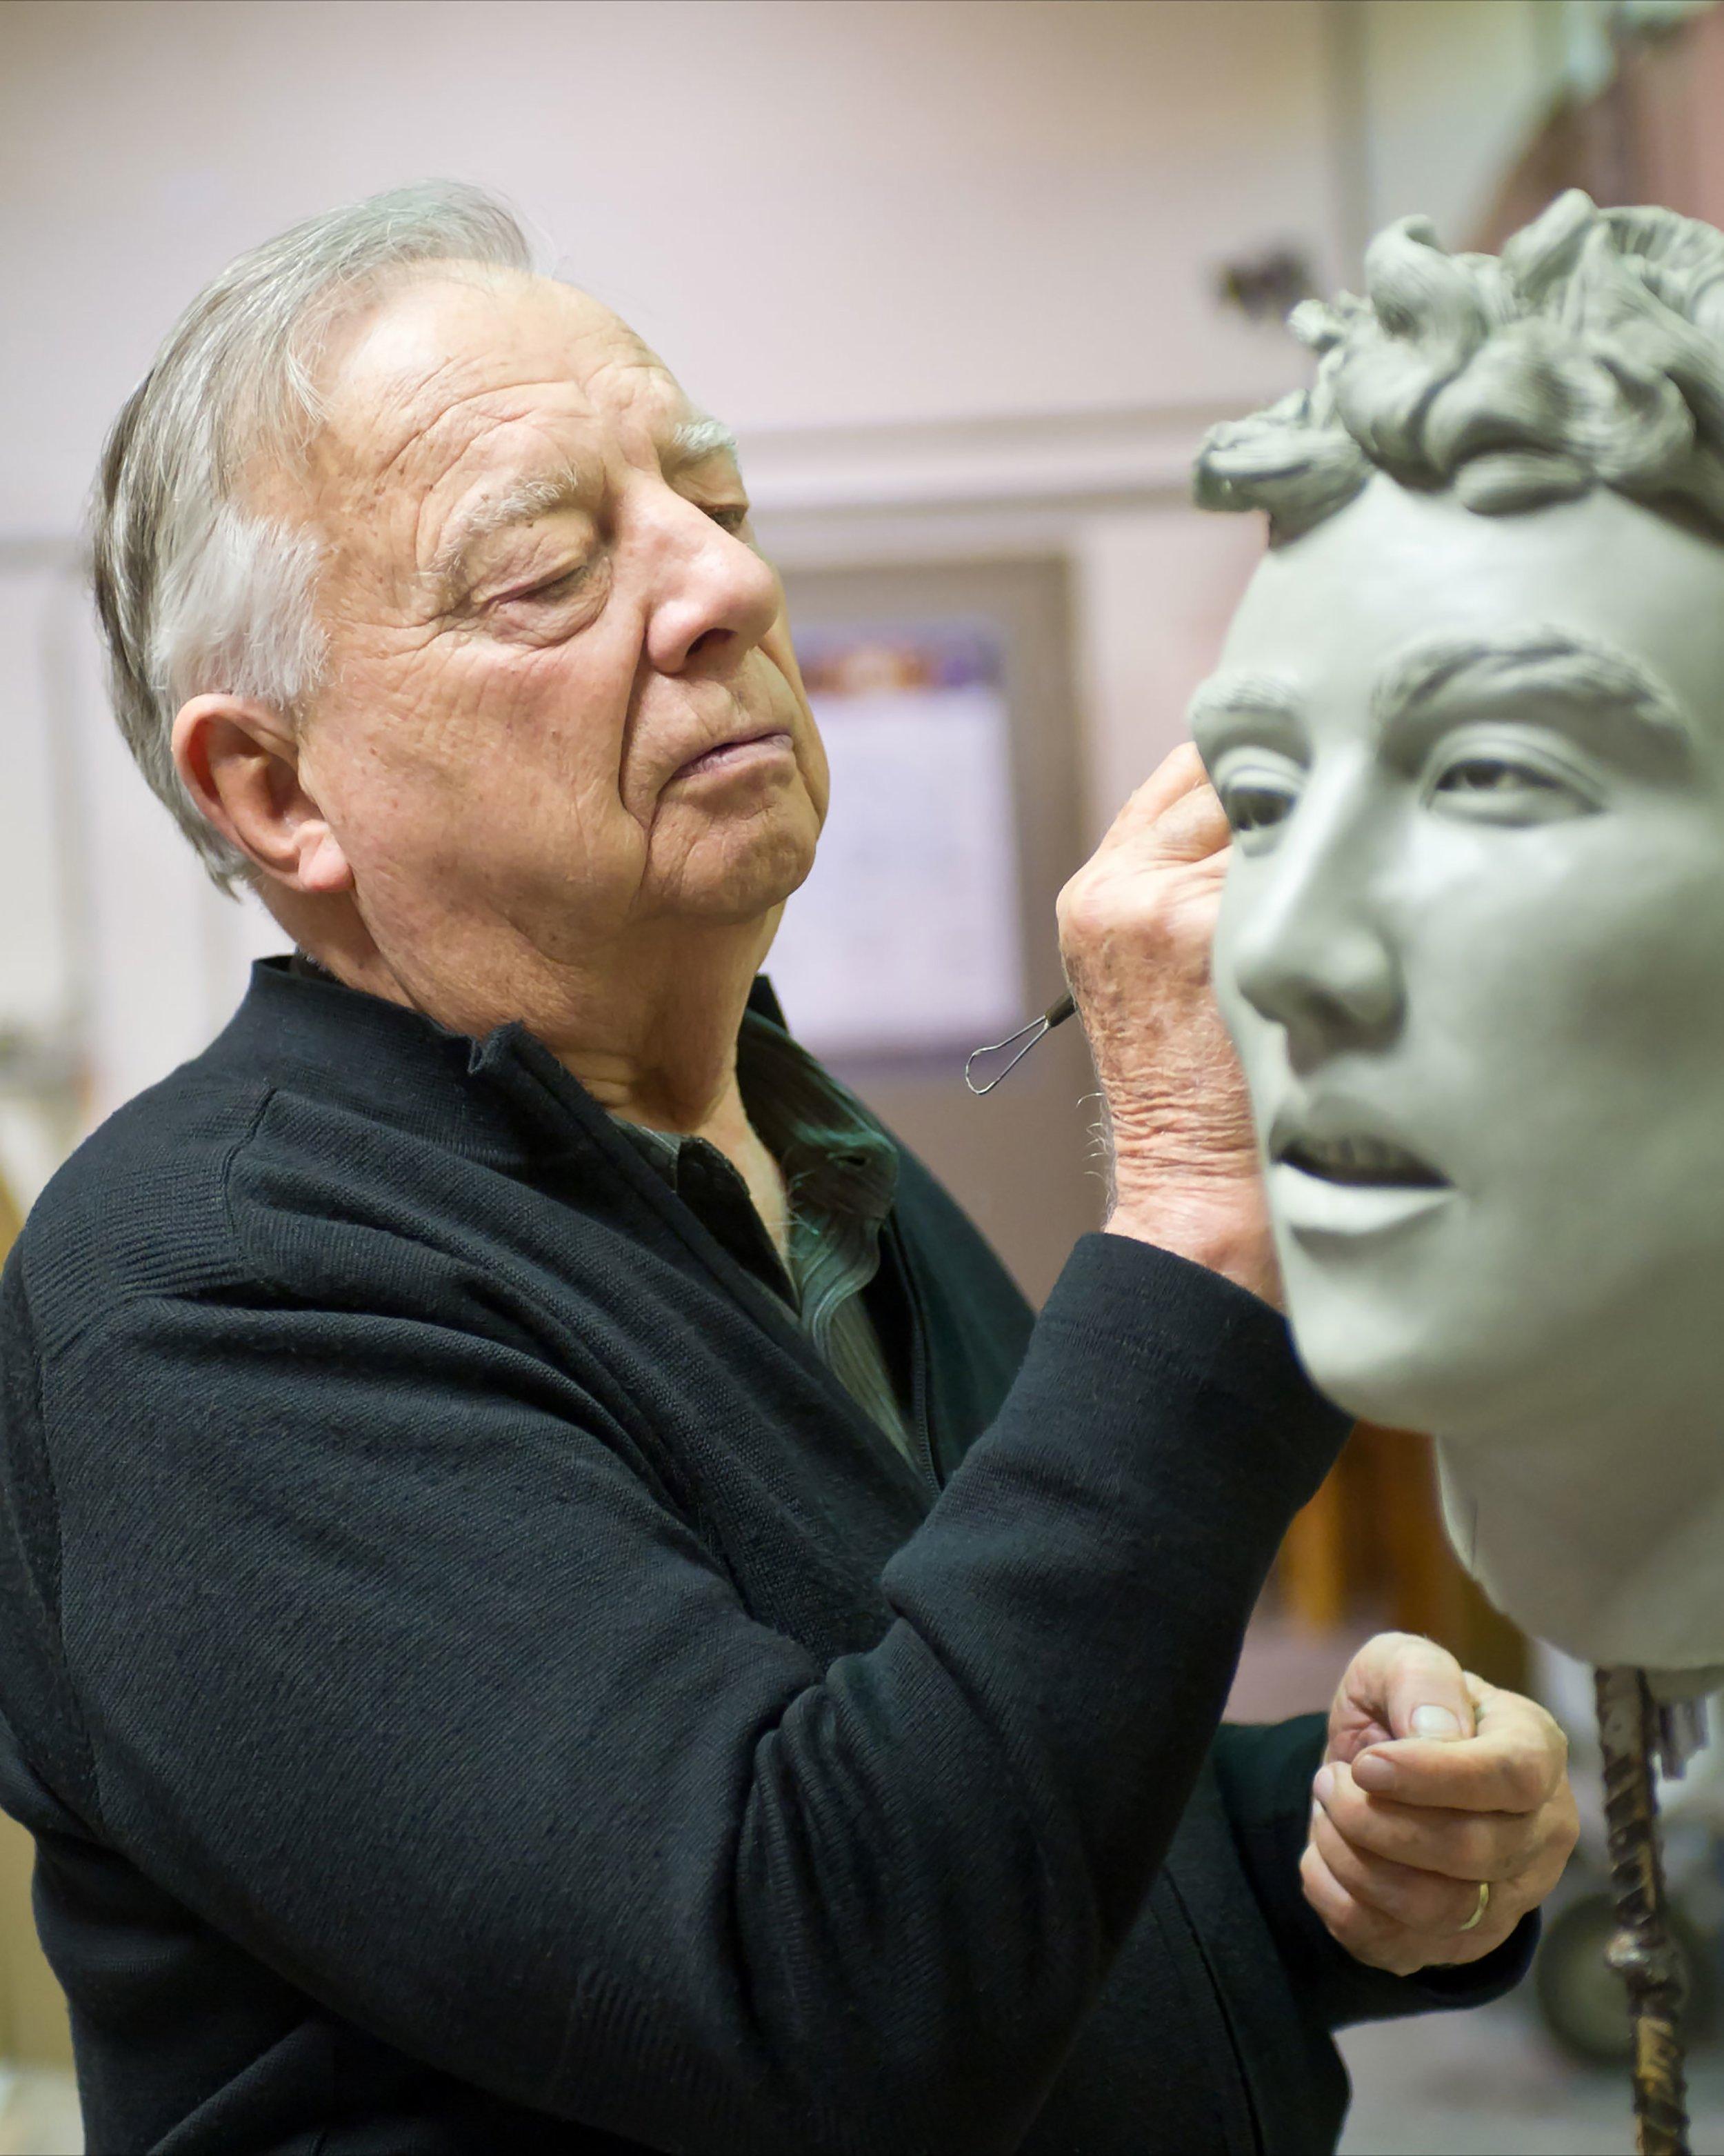 Photo of Seward Johnson sculpting,by David Steele